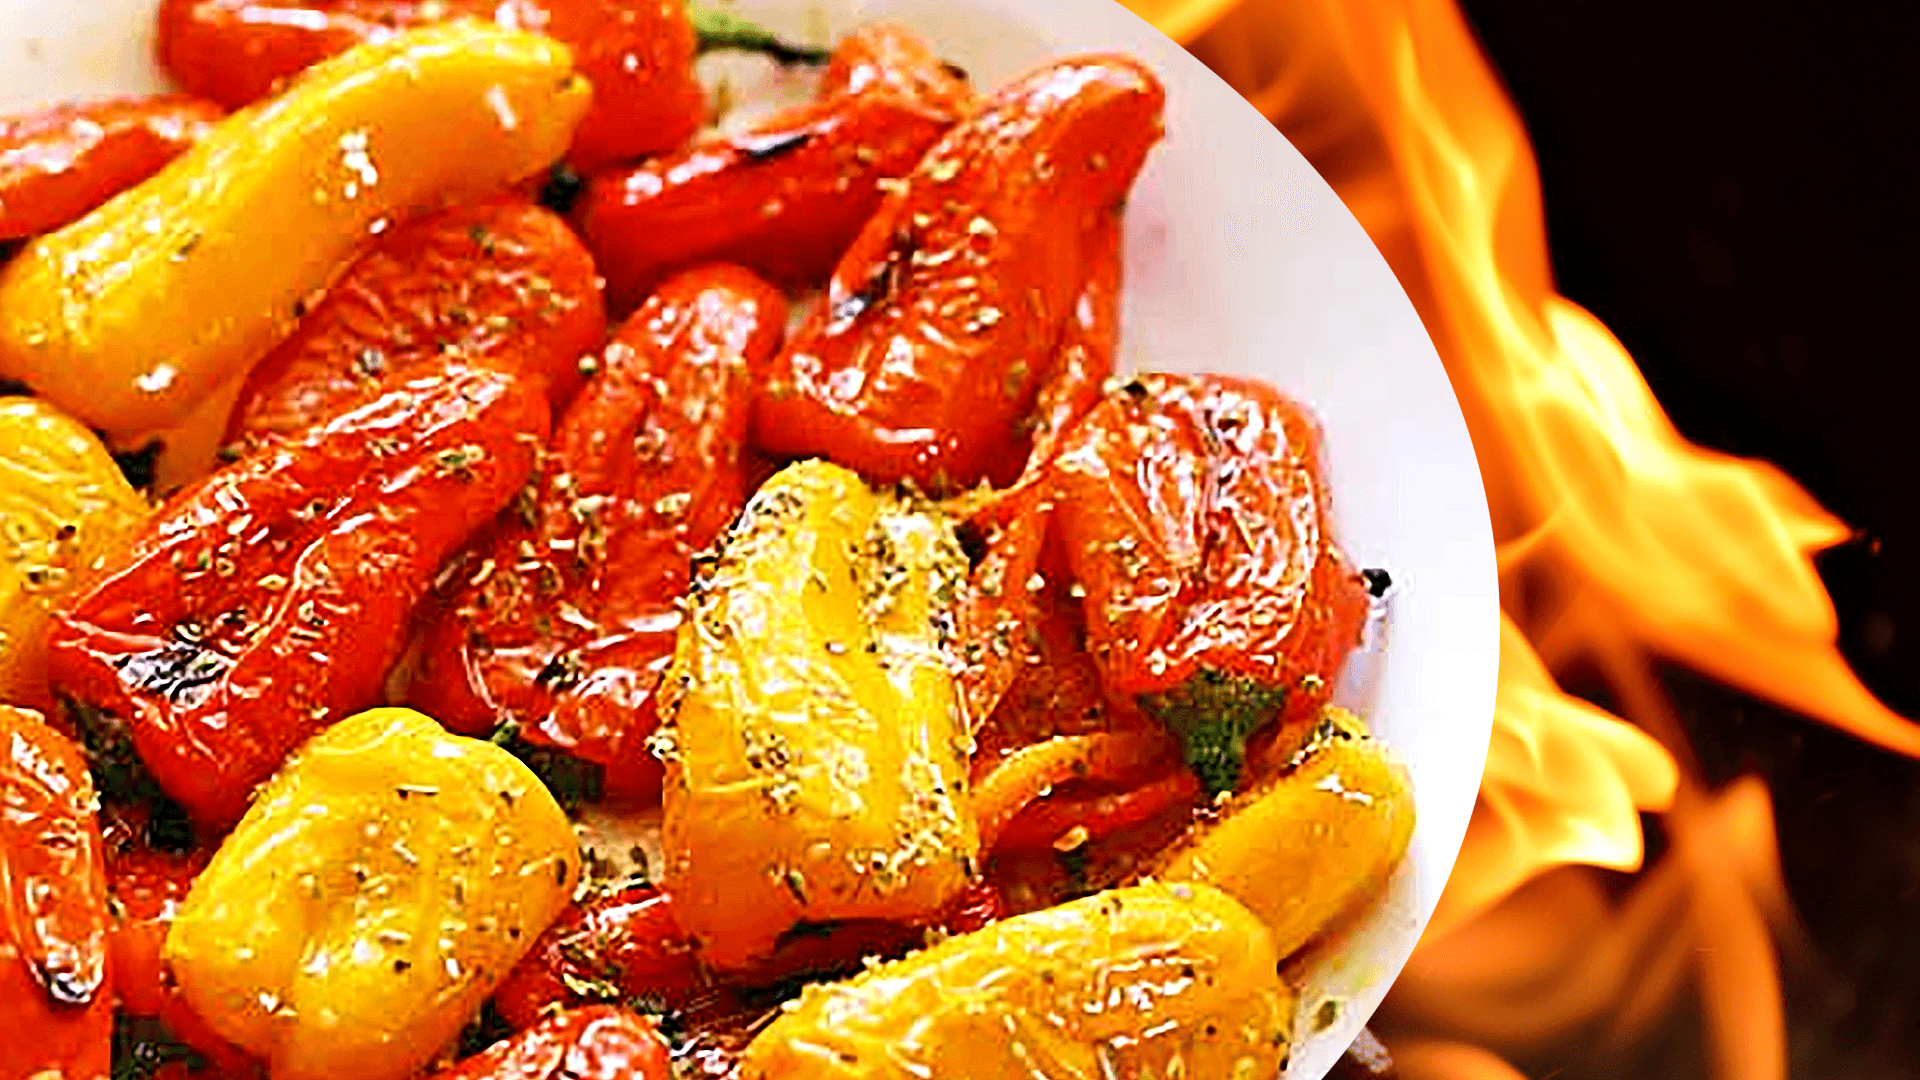 Roasted Pepper Salad with Vinegar - Easy Bell Pepper Salad Recipe